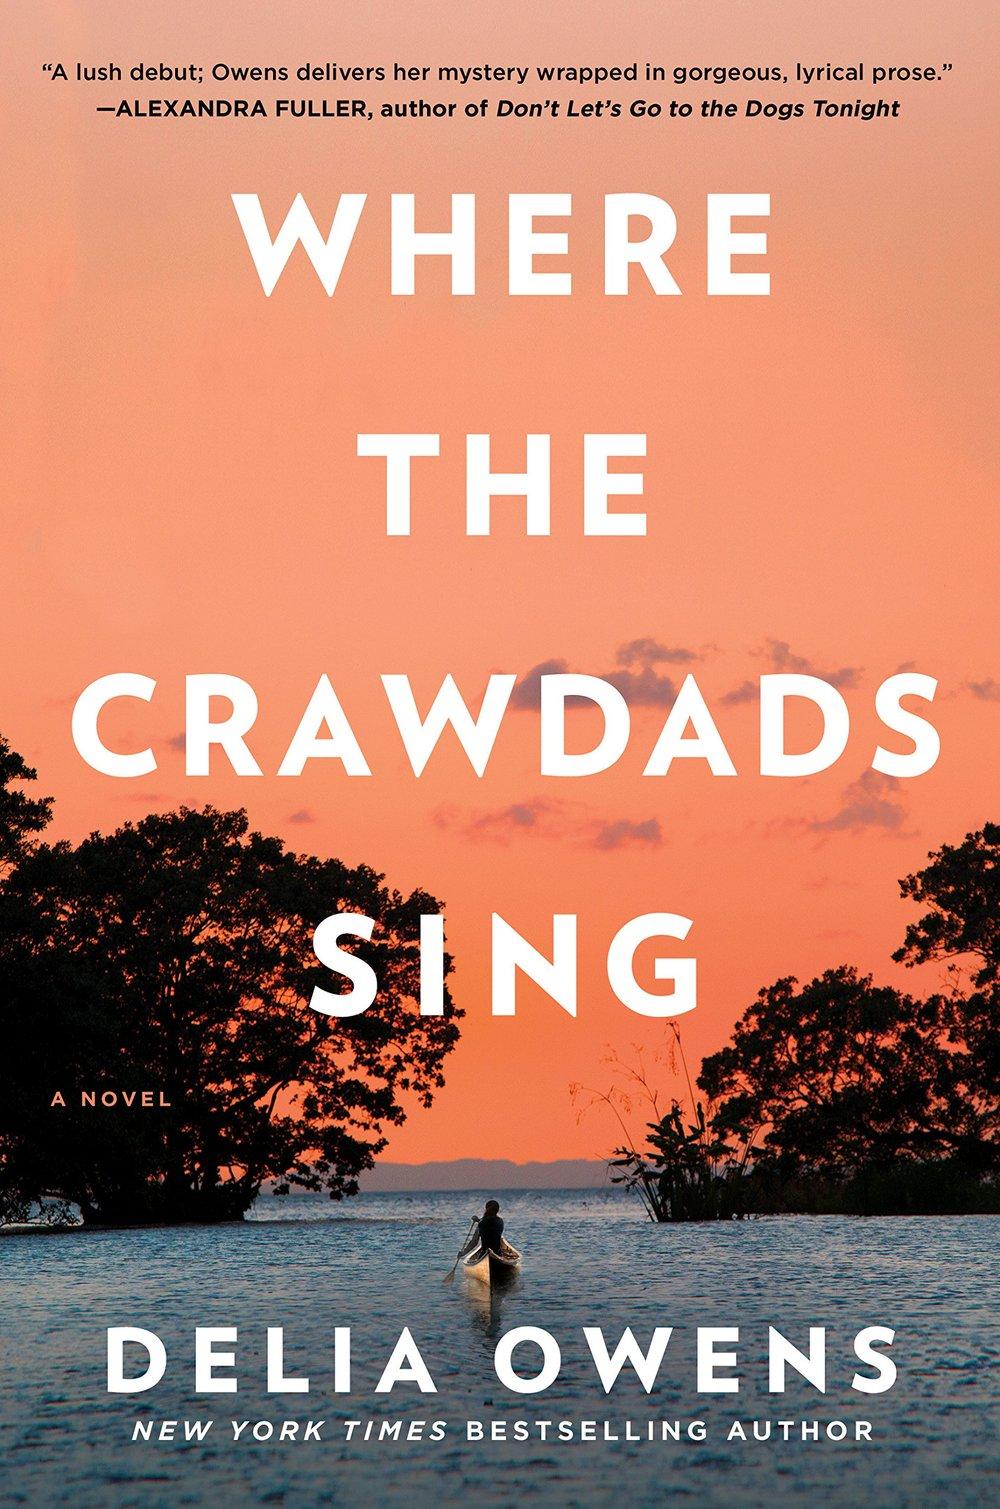 Where the Crawdads Sing by Delia Owens.jpg